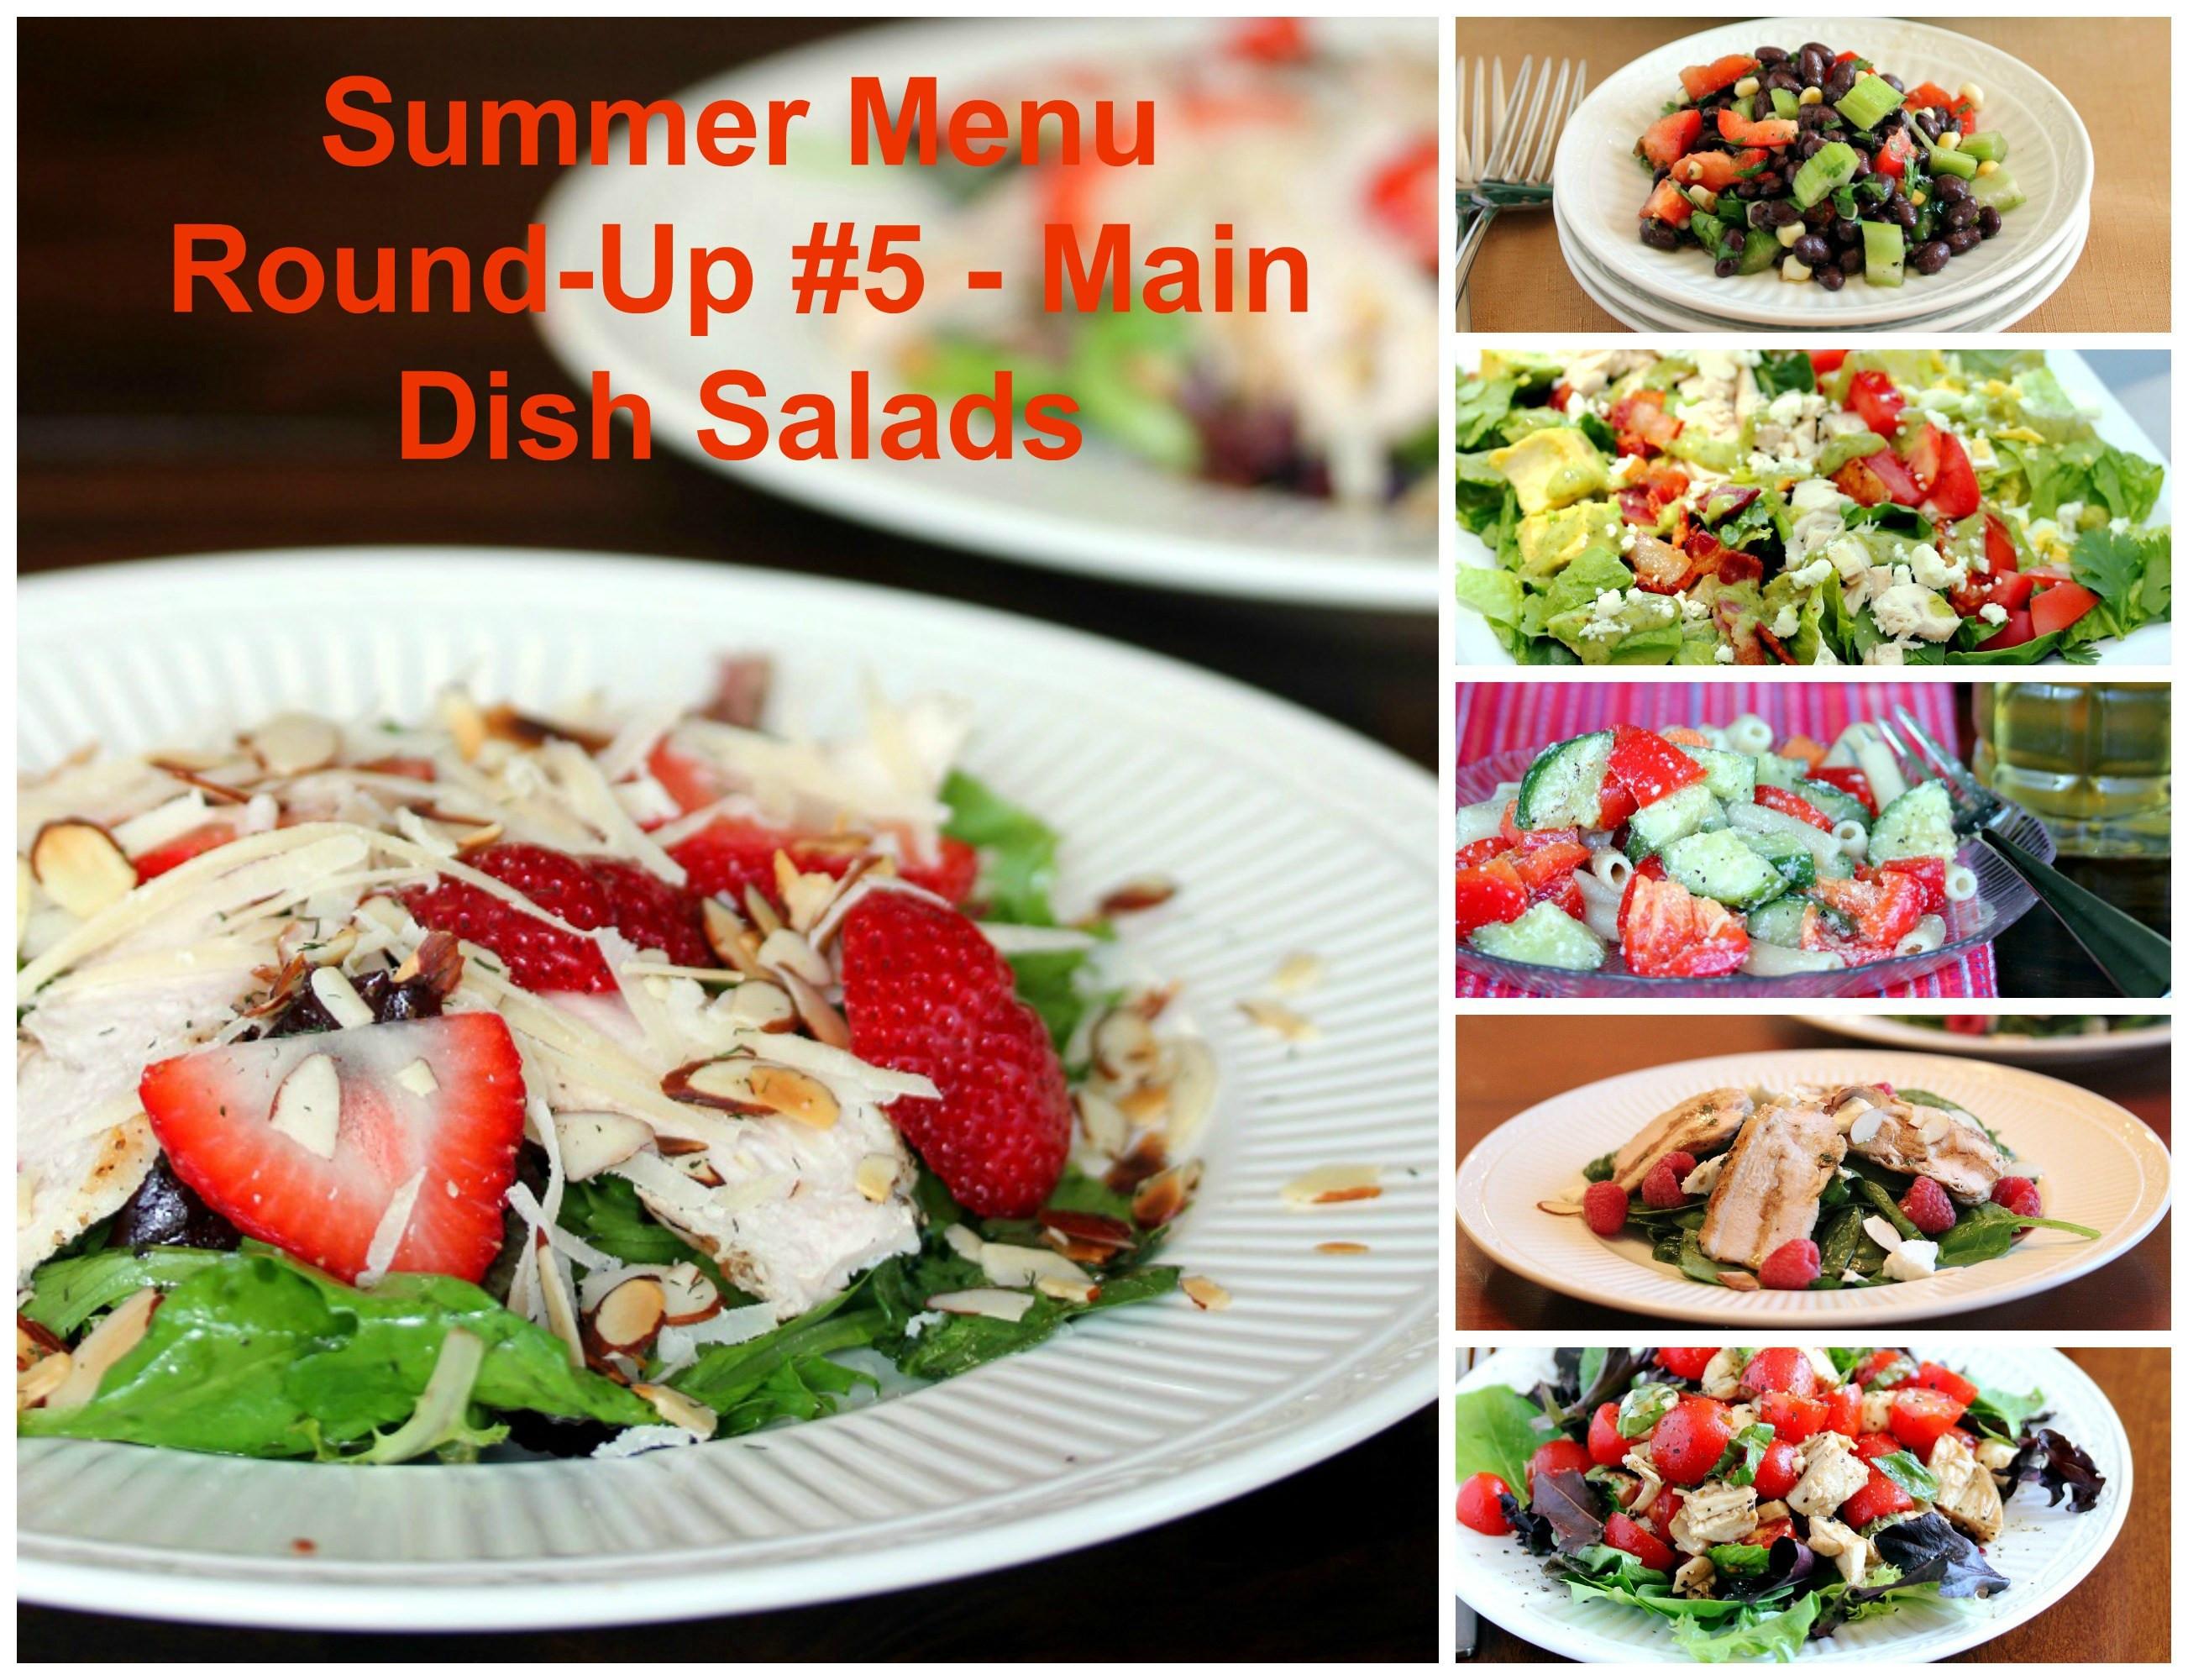 Summer Main Dish Salads  Summer Menu Round Up 5 Main Dish Salads Lisa s